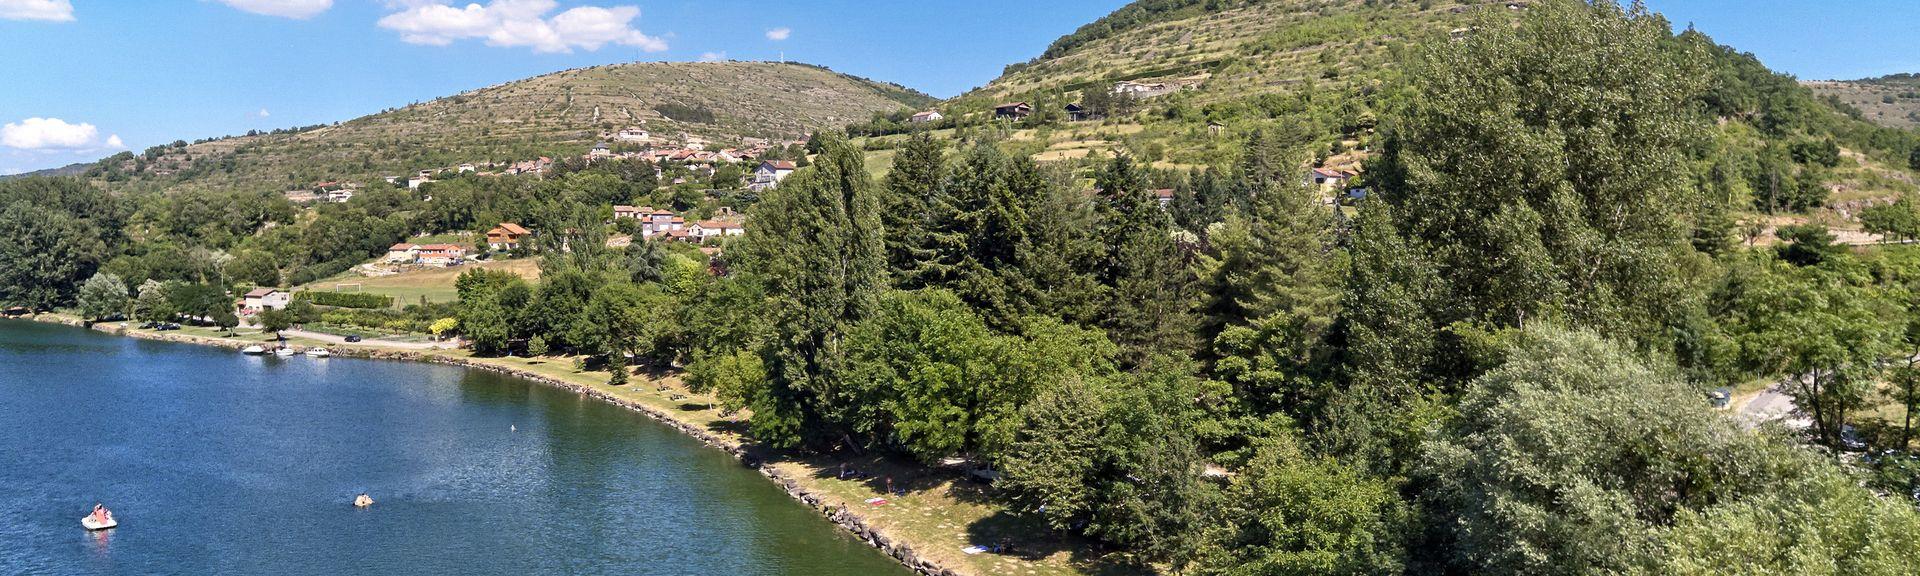 Saint-Rome-de-Tarn, Aveyron, Frankrijk